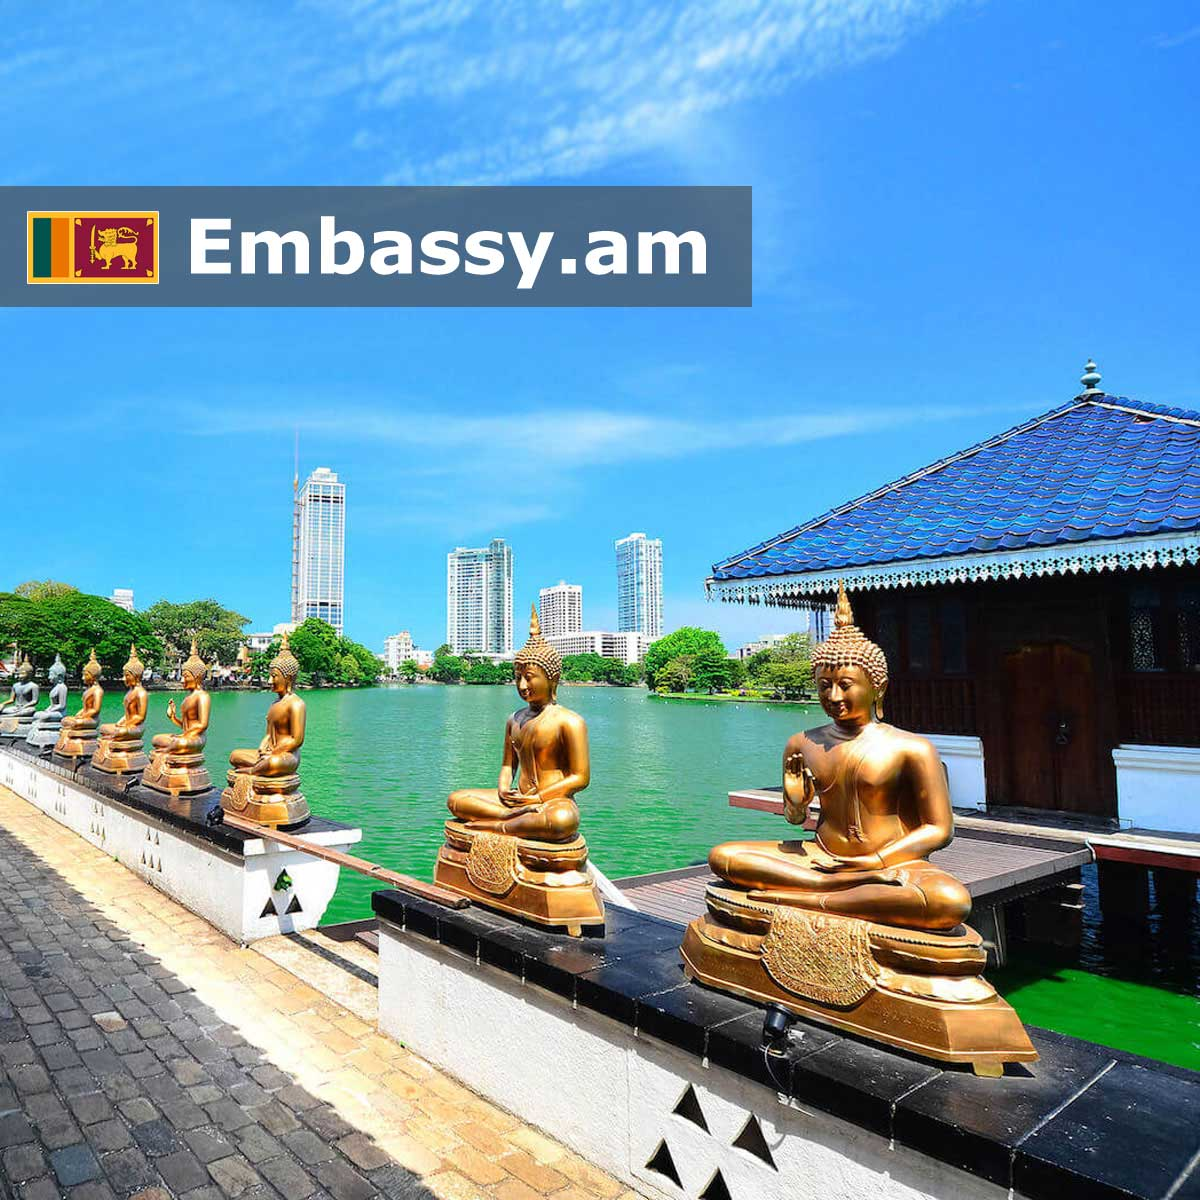 Отели в Шри-ланка - Embassy.am